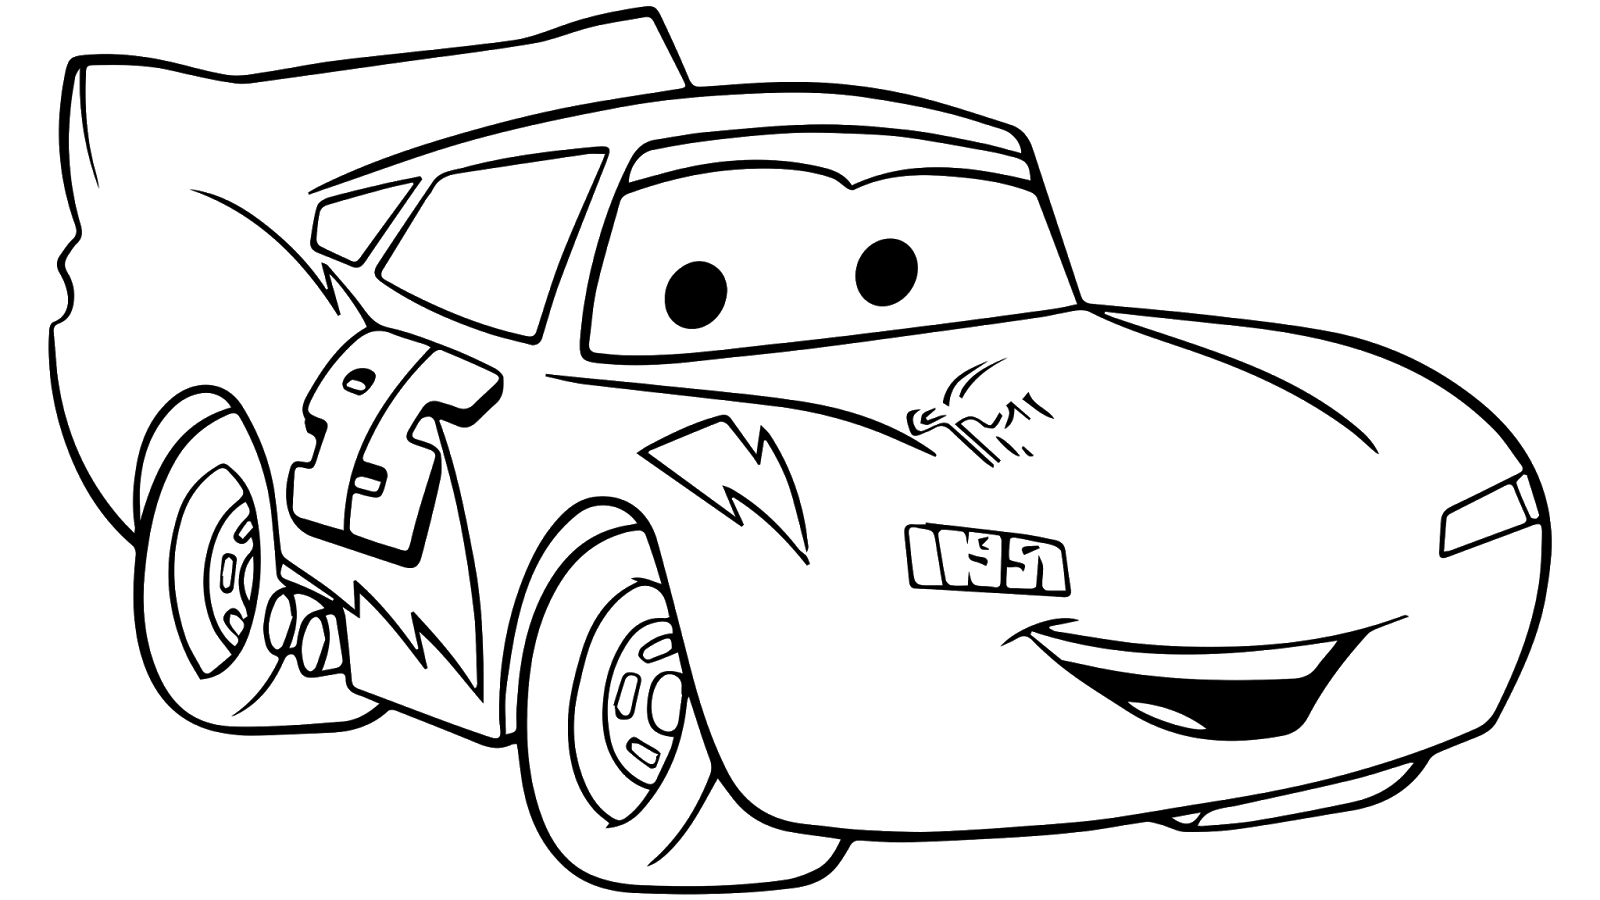 Mater car clip art. Pomegranate clipart black and white